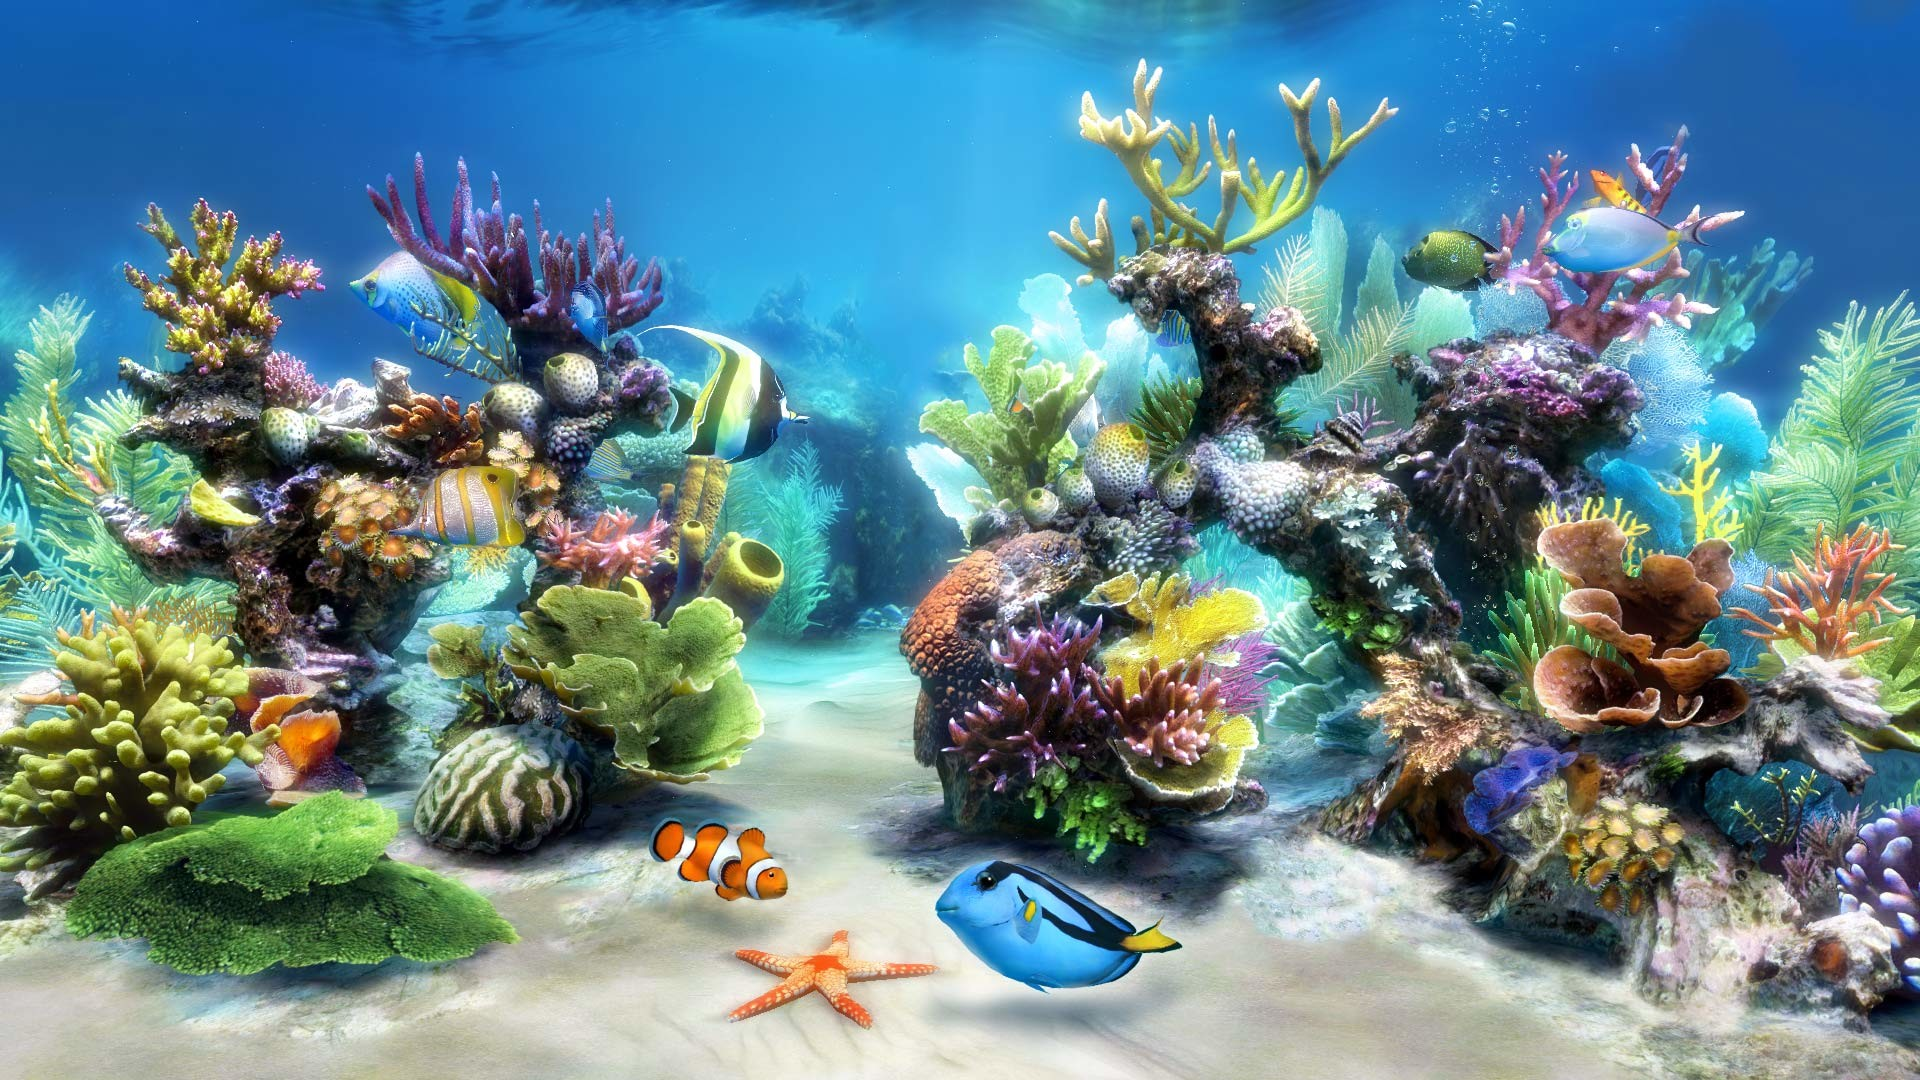 Full Size of Fish Tank Stirring Fish Tank Screensaver Photos Concept  Freeware Screensaversdows Best Ukeknd Freesh …